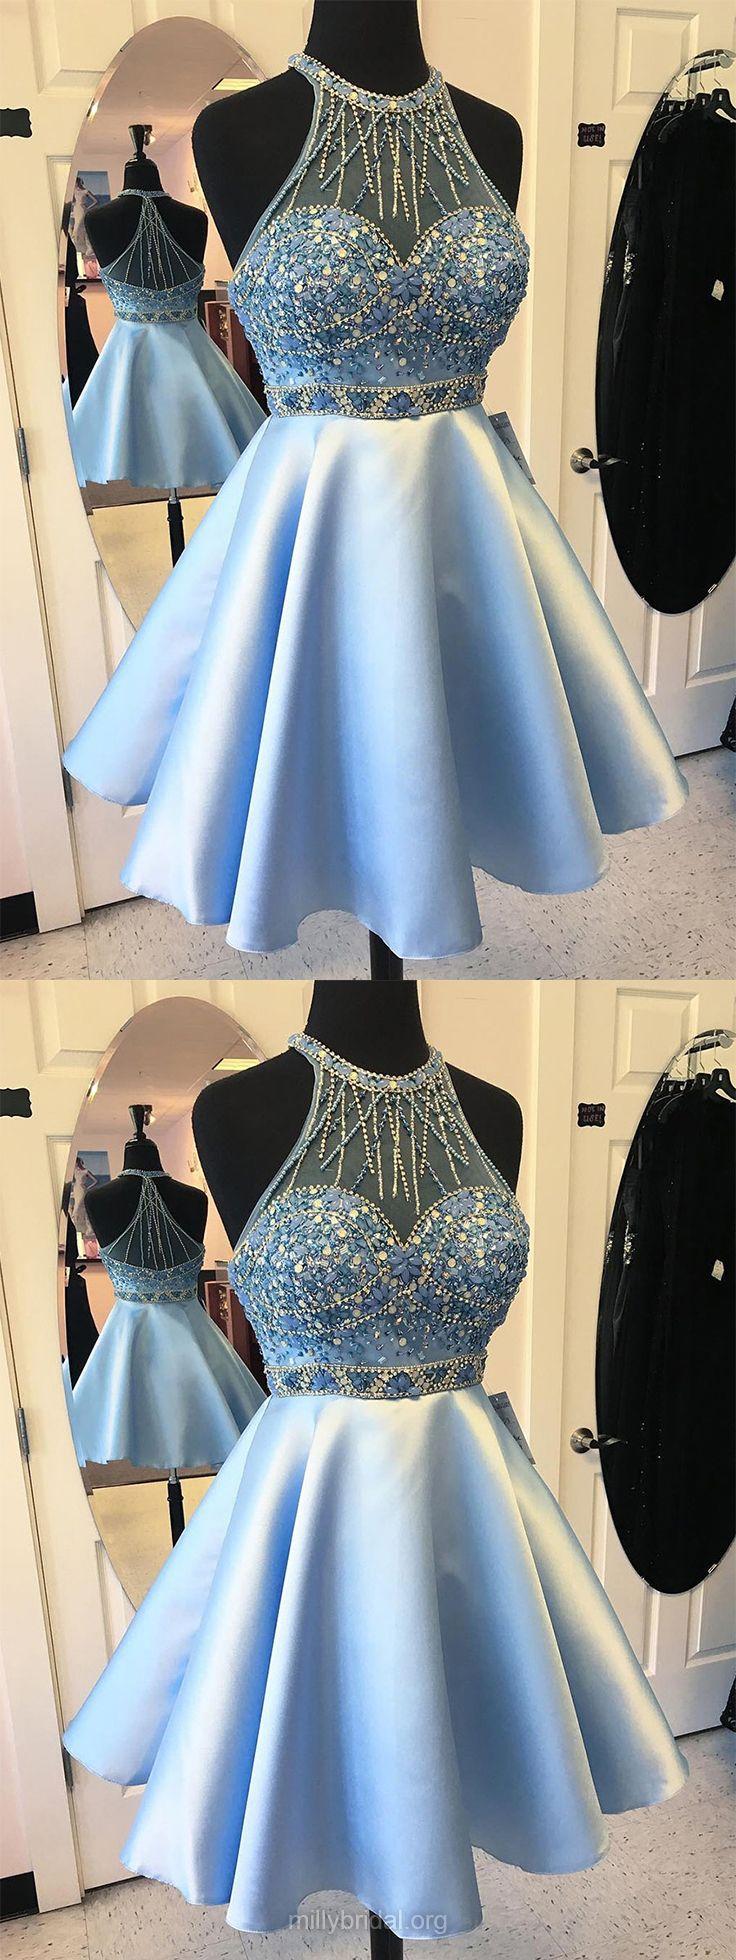 Blue Prom Dresses Short, 2018 Prom Dresses For Teens, A-line Prom ...